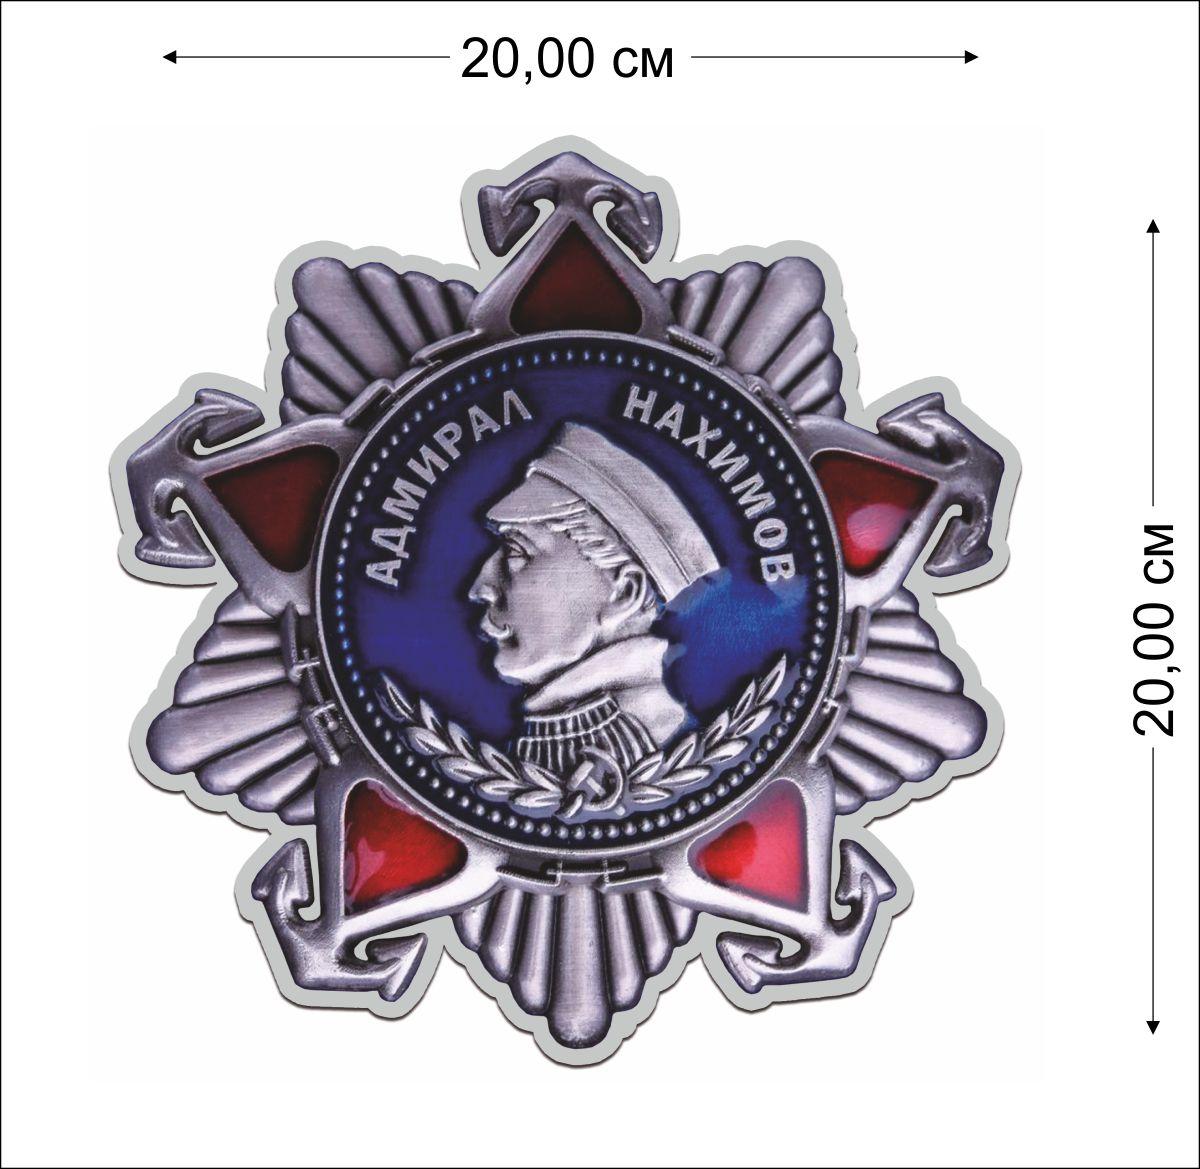 Наклейка с орденом Нахимова 2 степени